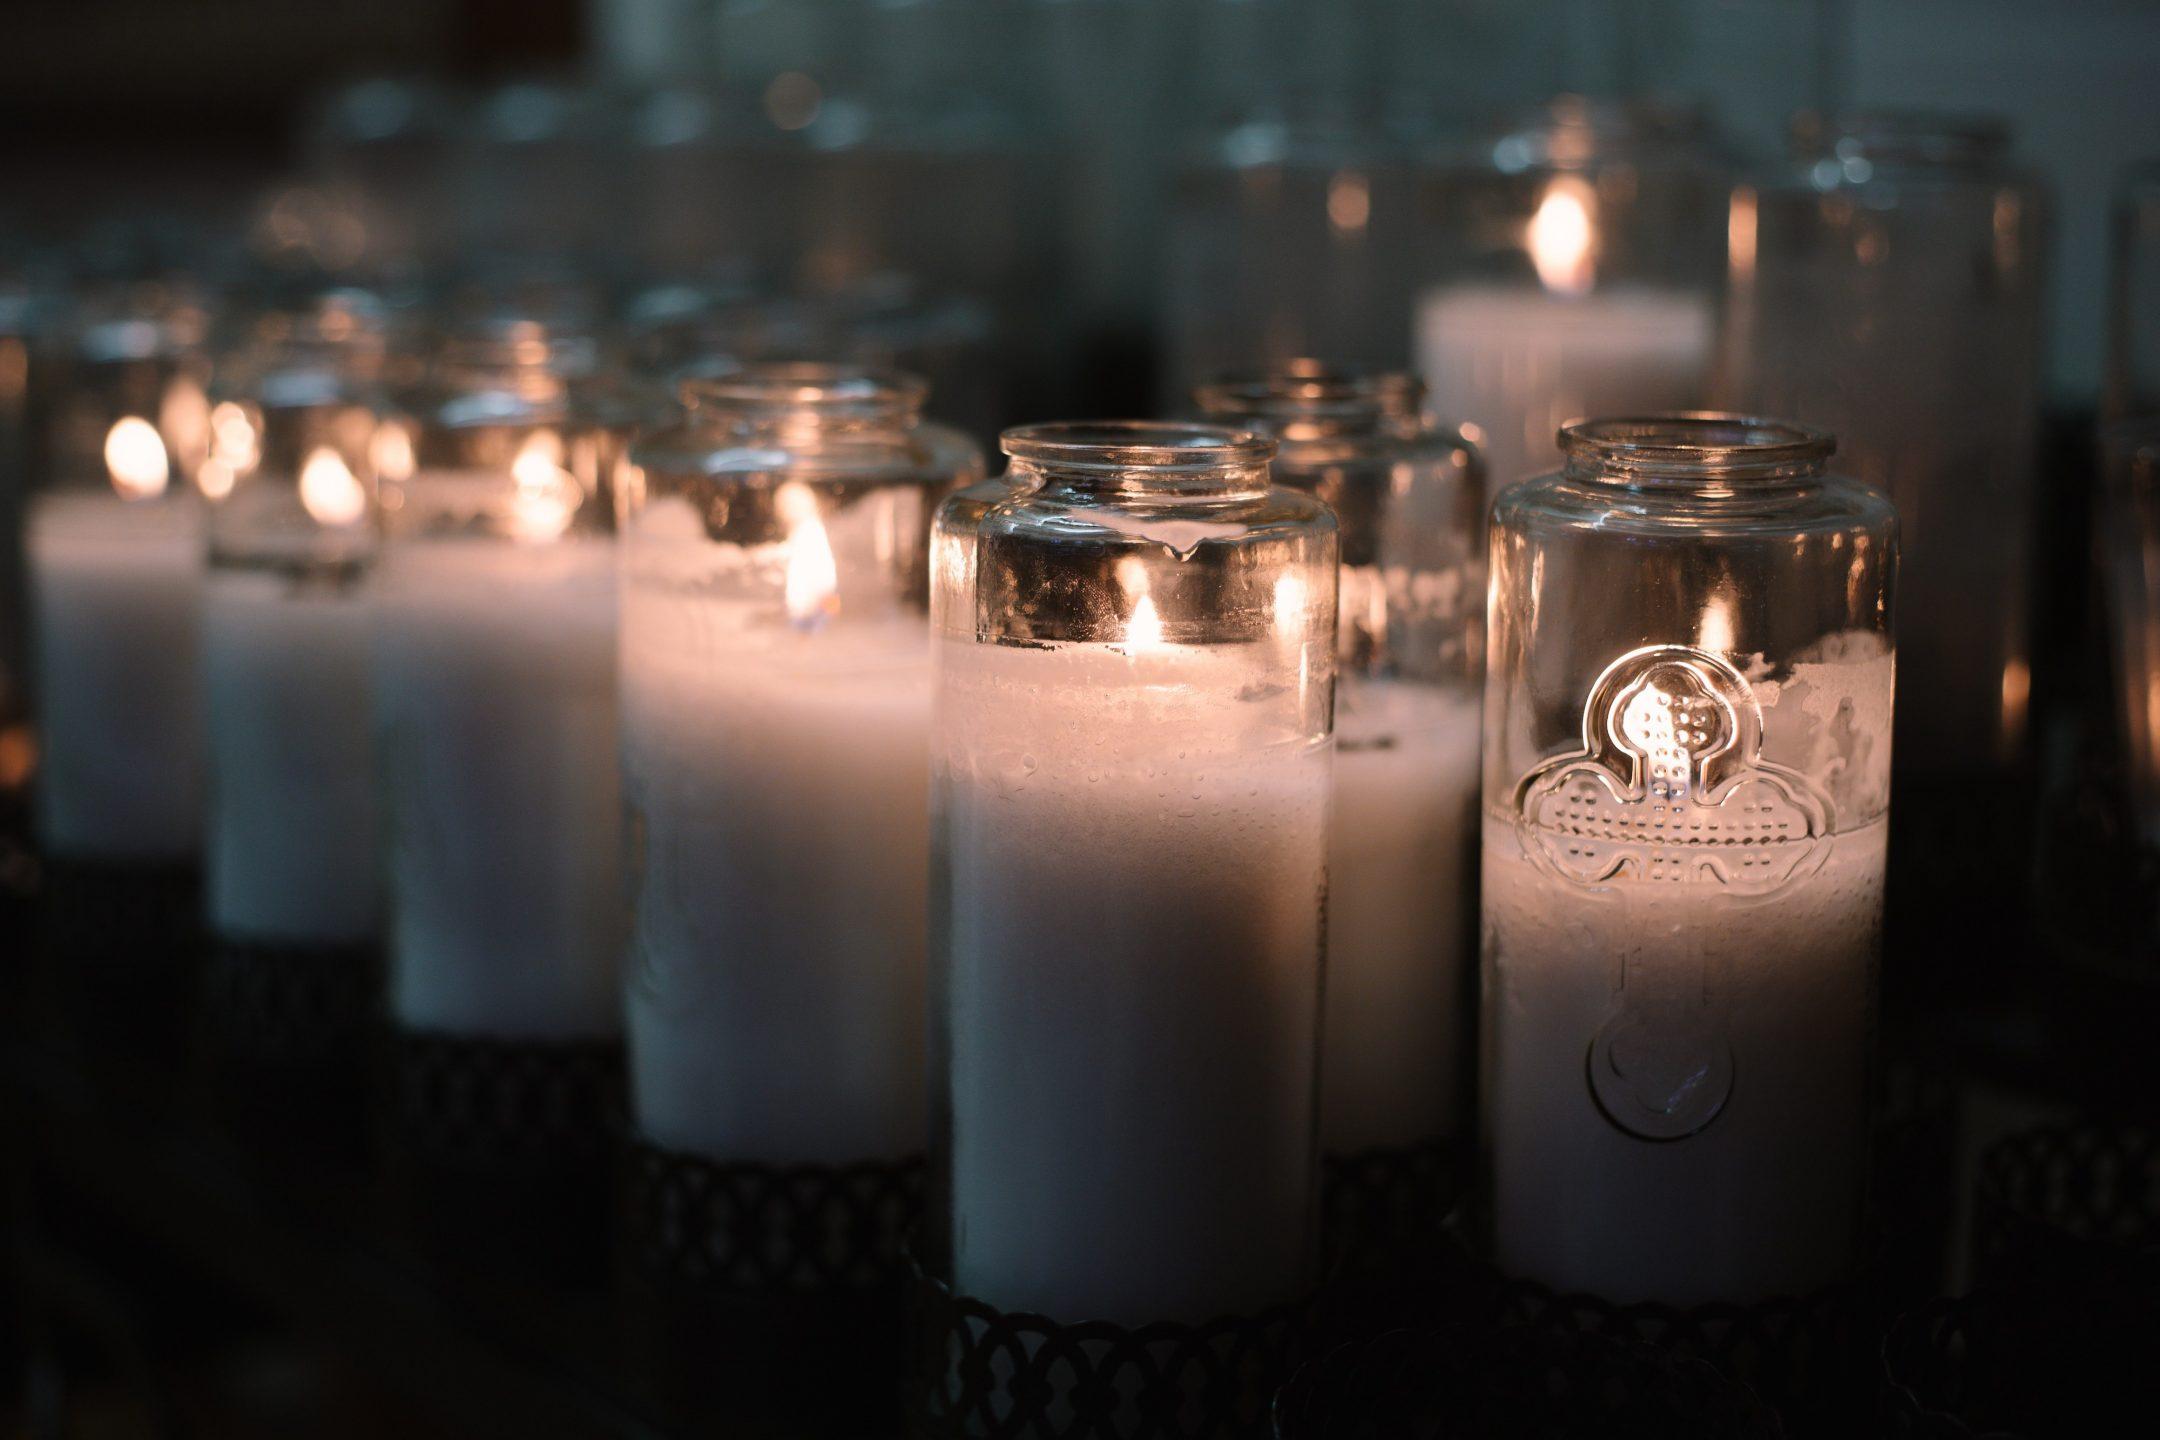 Lit prayer candles